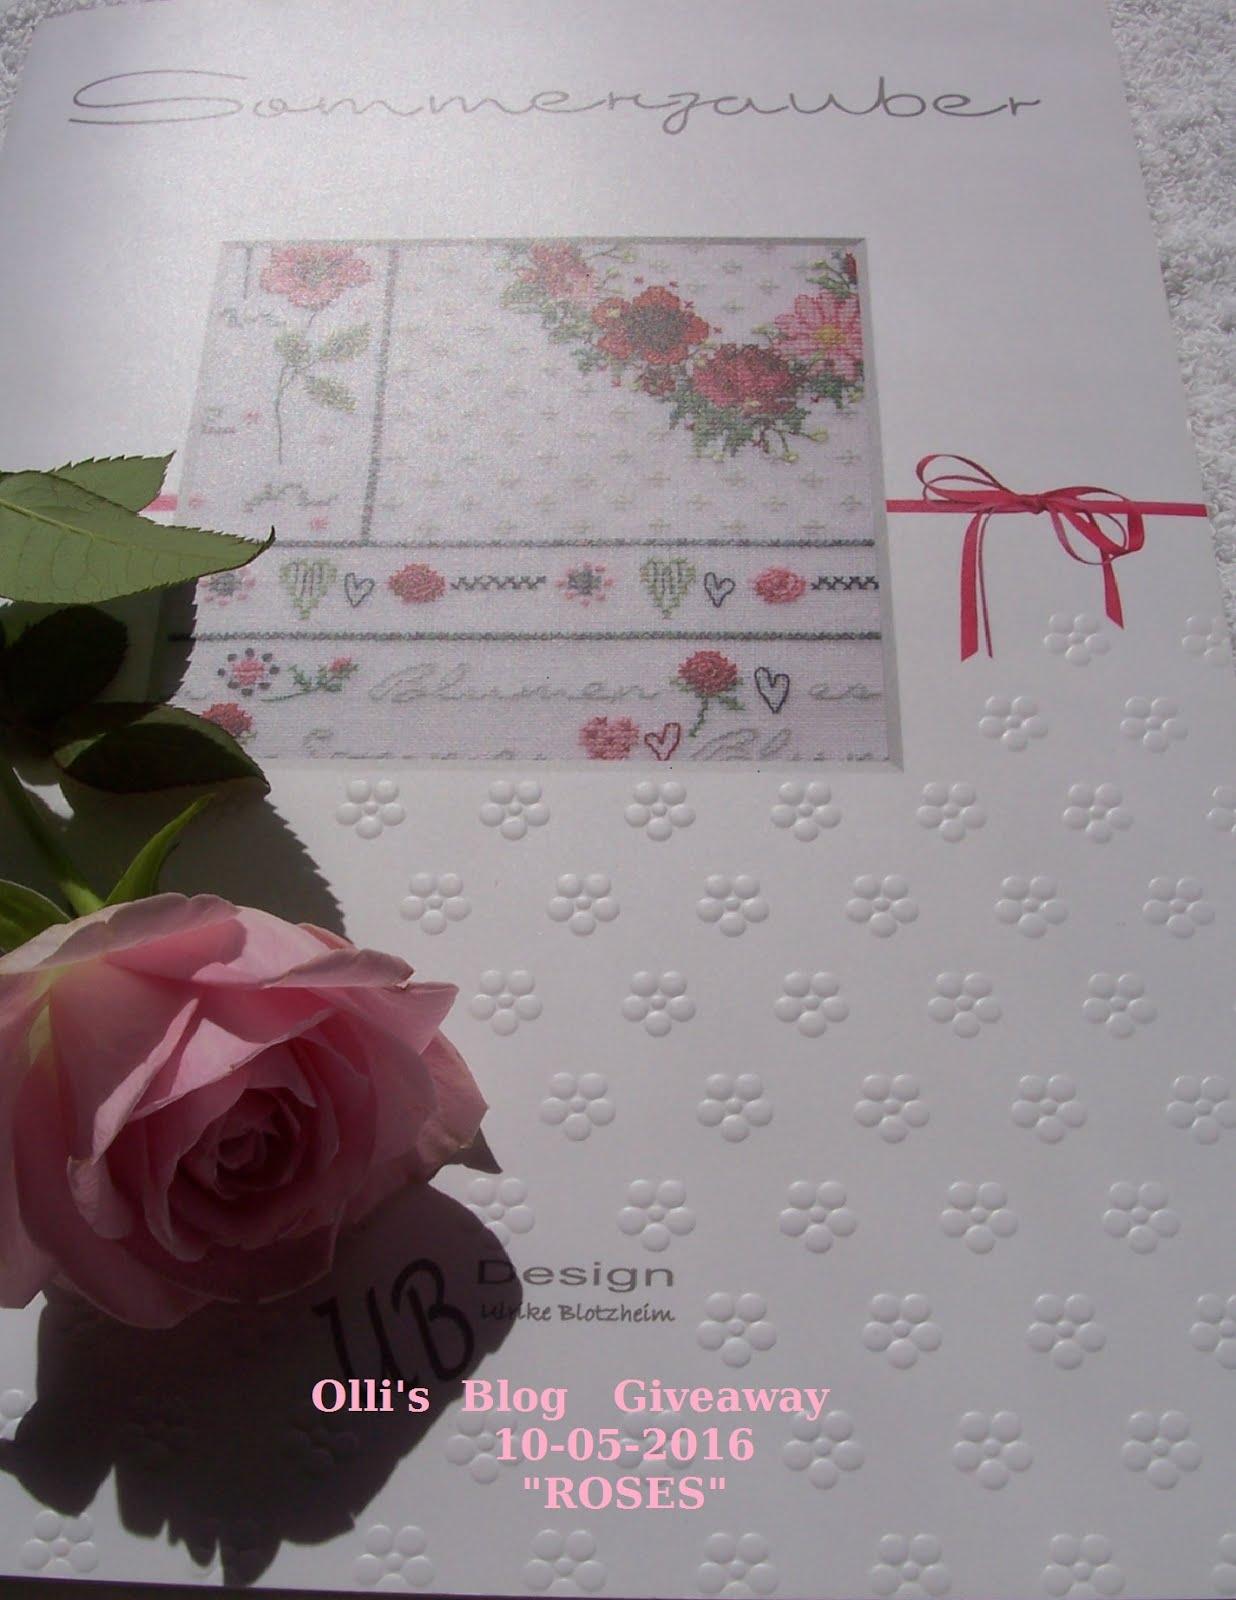 Olli's blog giveaway